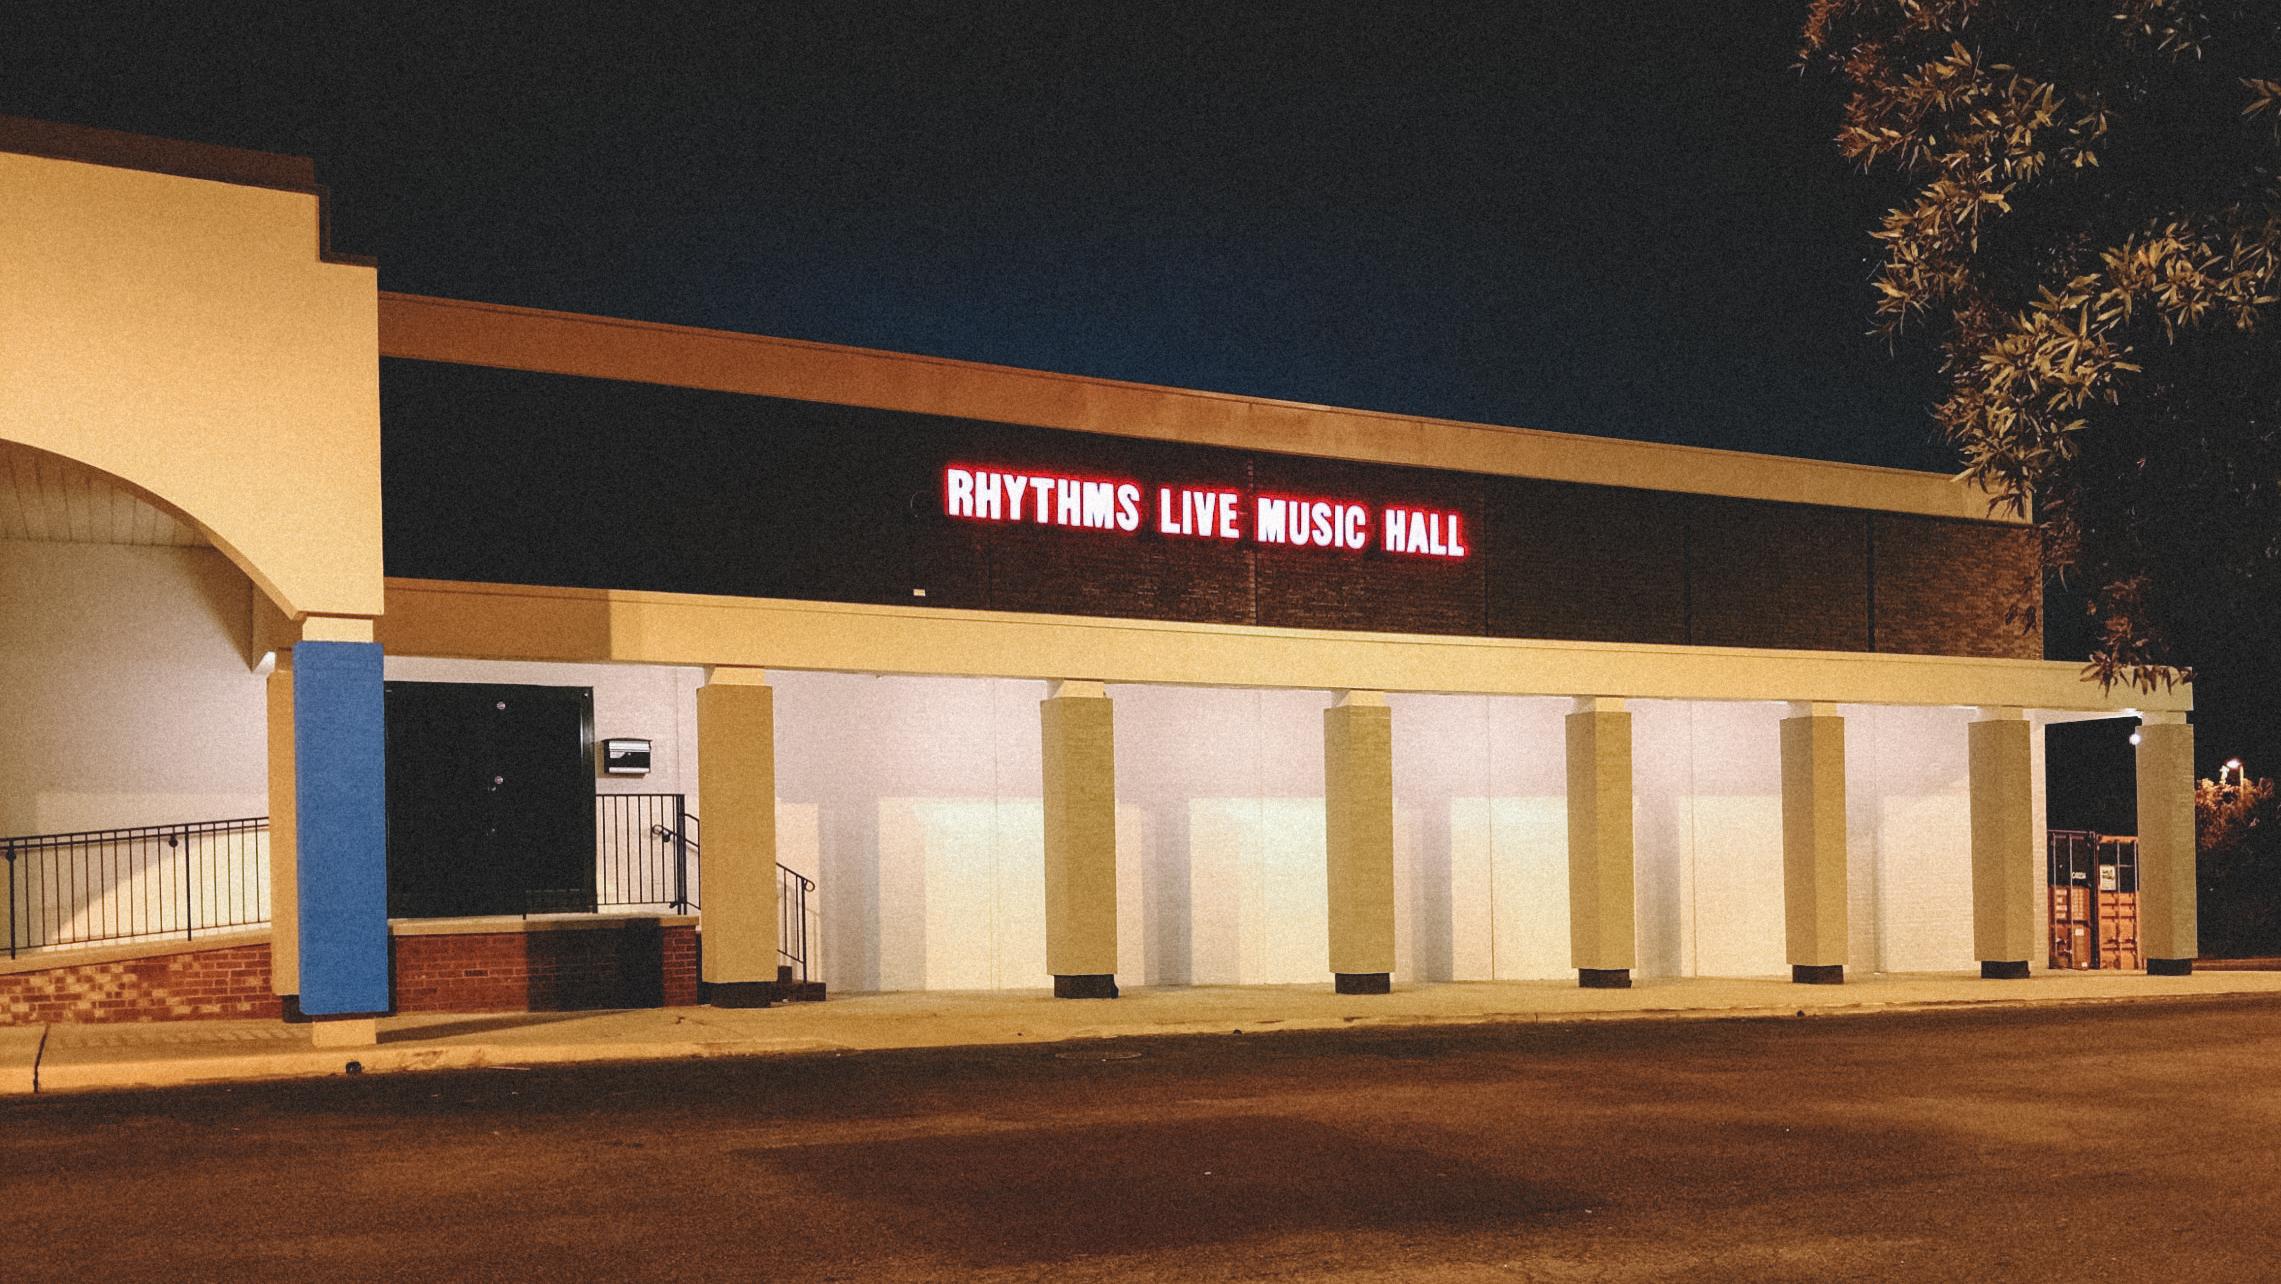 About Rhythms Live – Rhythms Live Music Hall